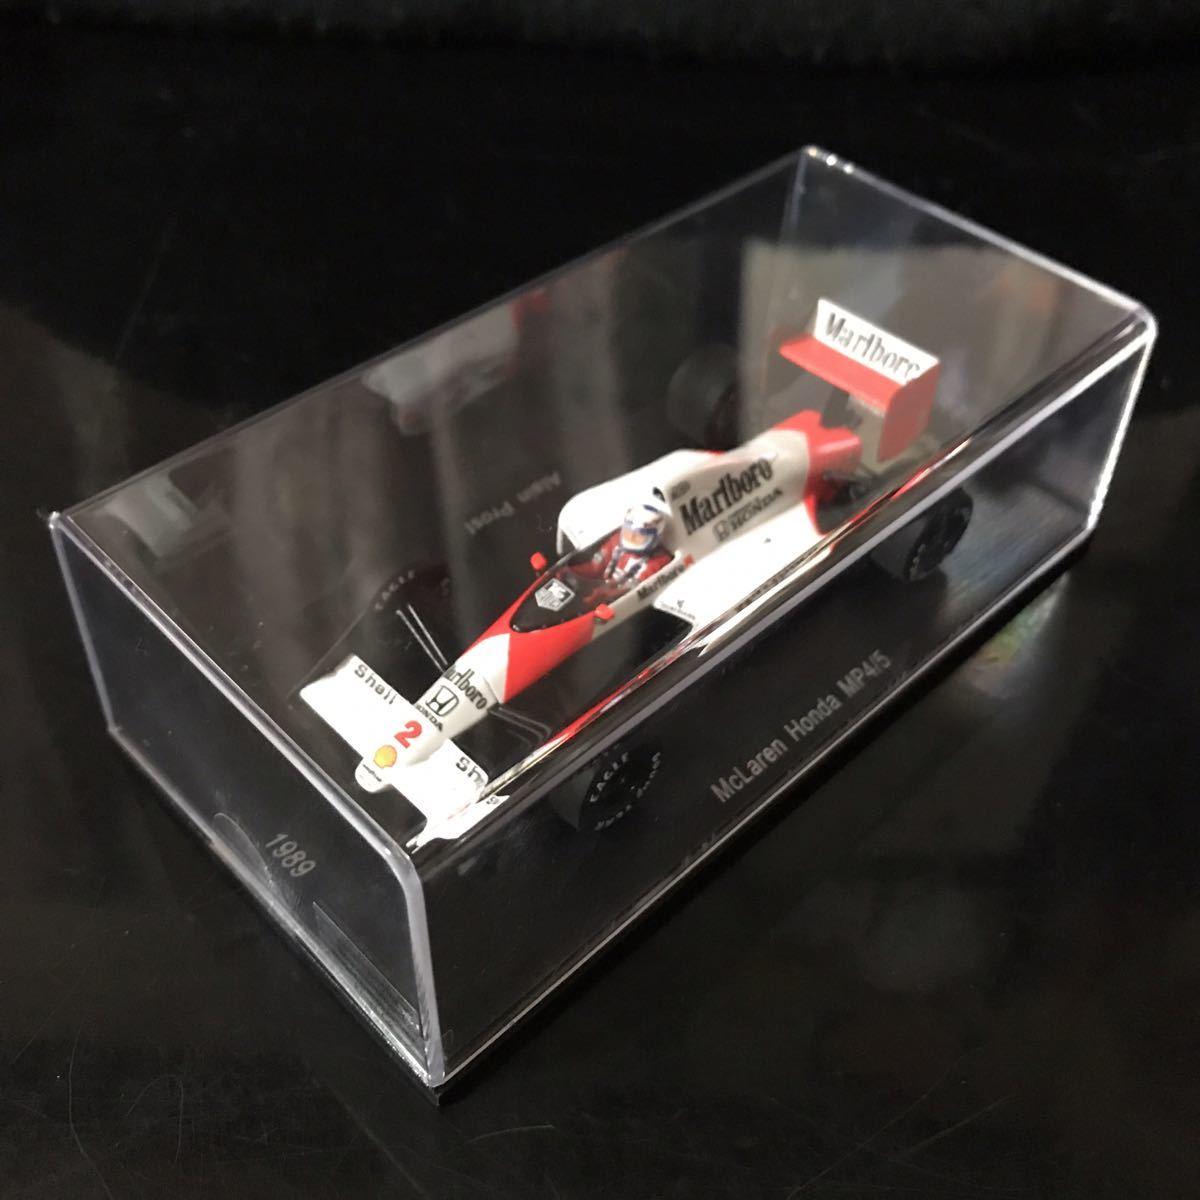 ES別注 スパーク 1/43 ホンダ マールボロ マクラーレン MP4/5 #2 A.プロスト 1989 ワールドチャンピオン マルボロ仕様_画像9